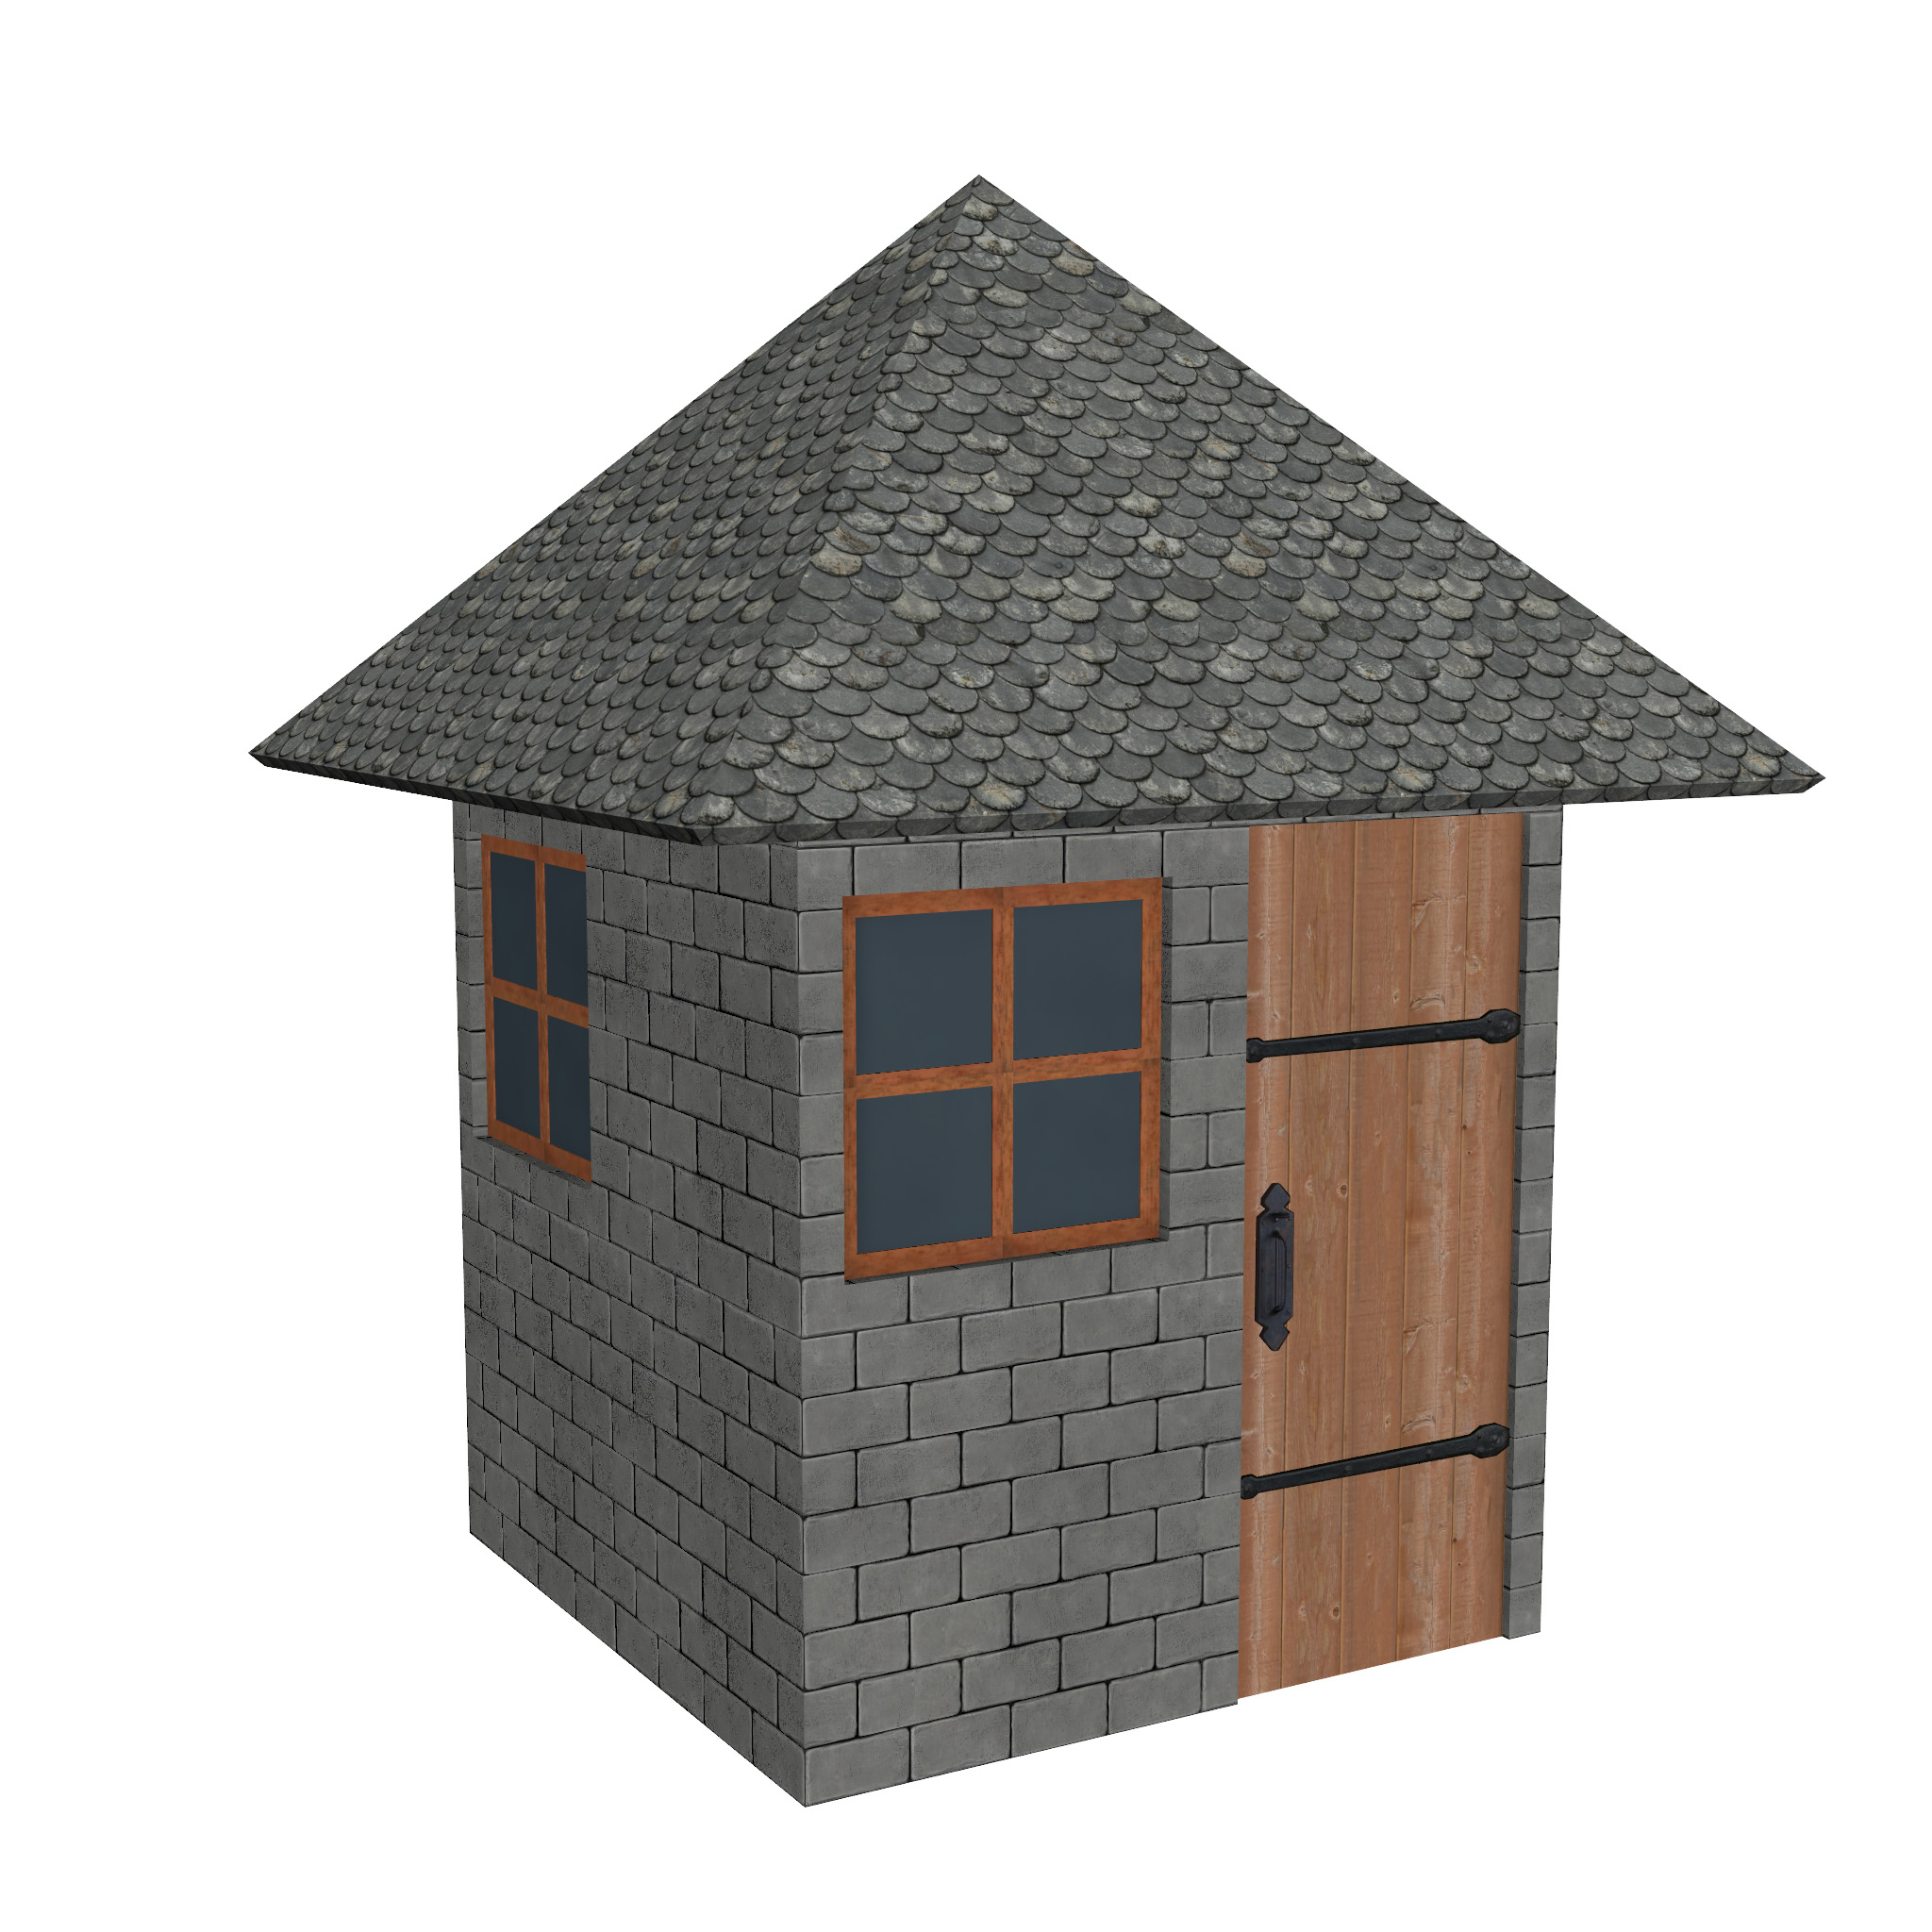 modular brick house set 3d model fbx ma mb 271414